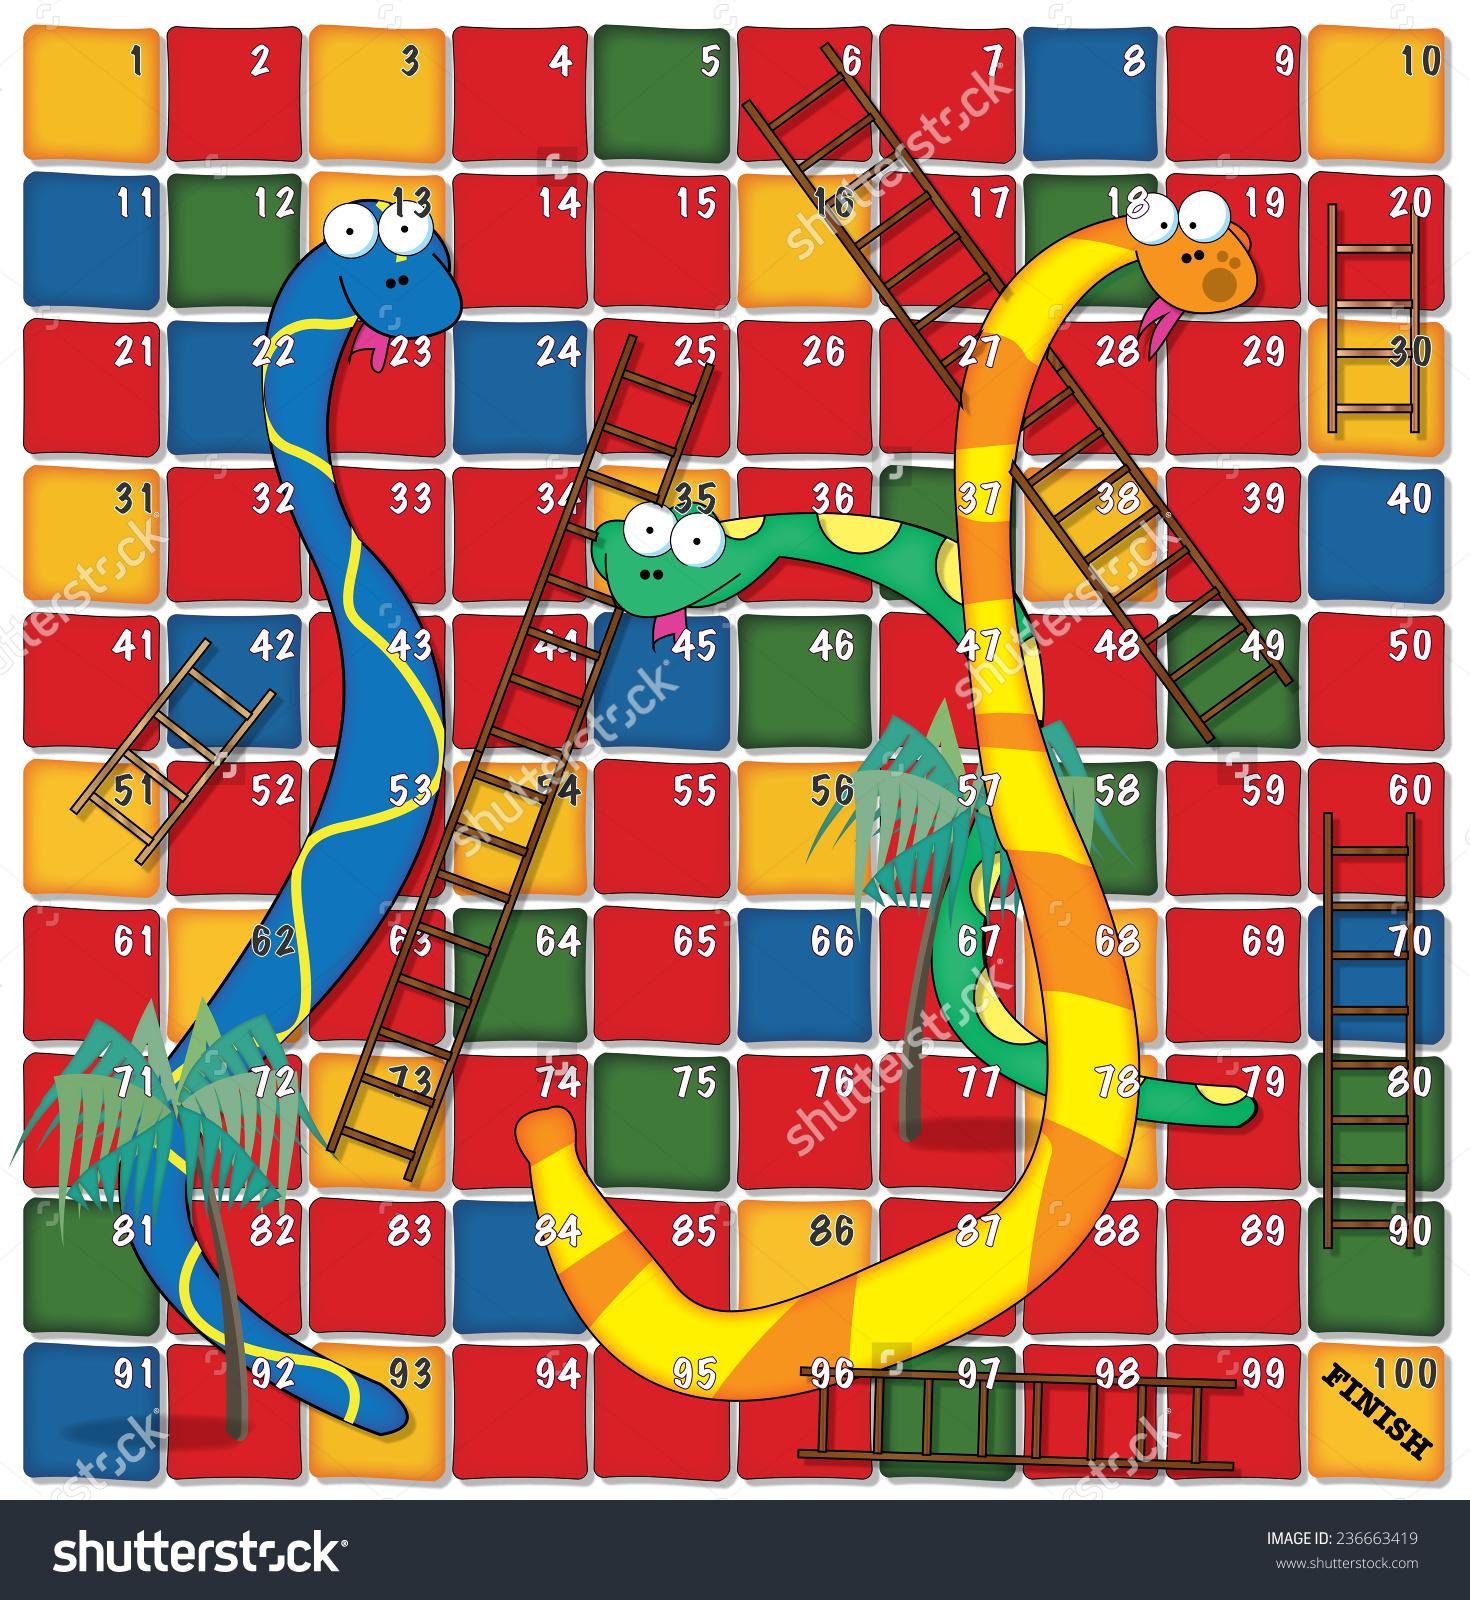 Snakes Ladders Board Game Stock Illustration 236663419.